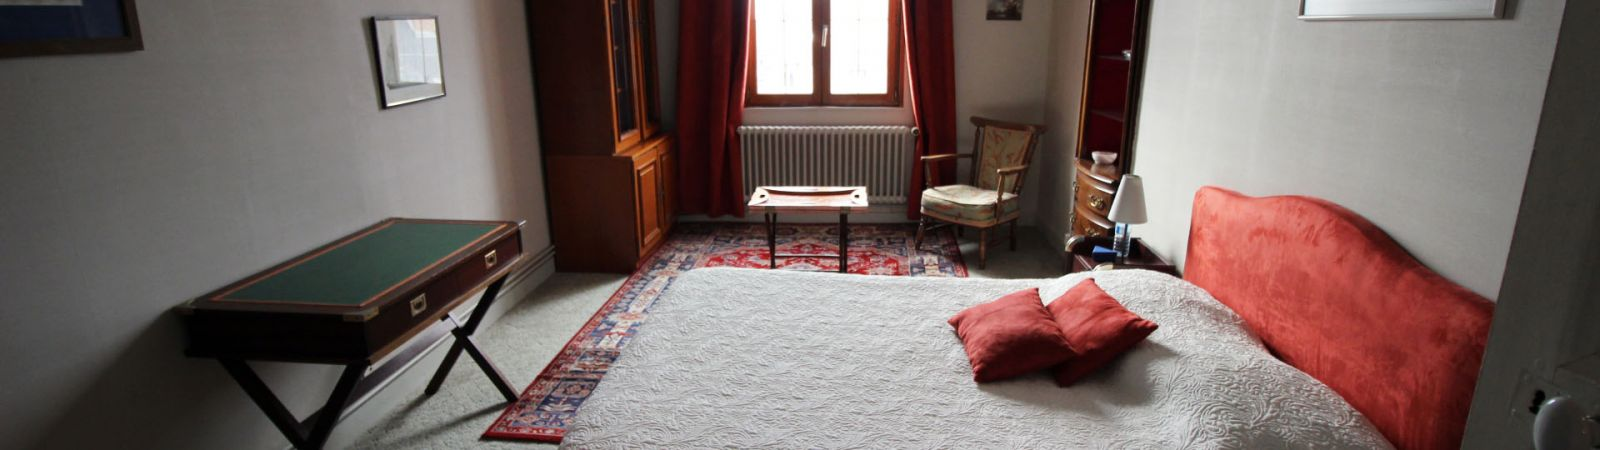 photo 10: Somptueuse demeure du XIXème siècle